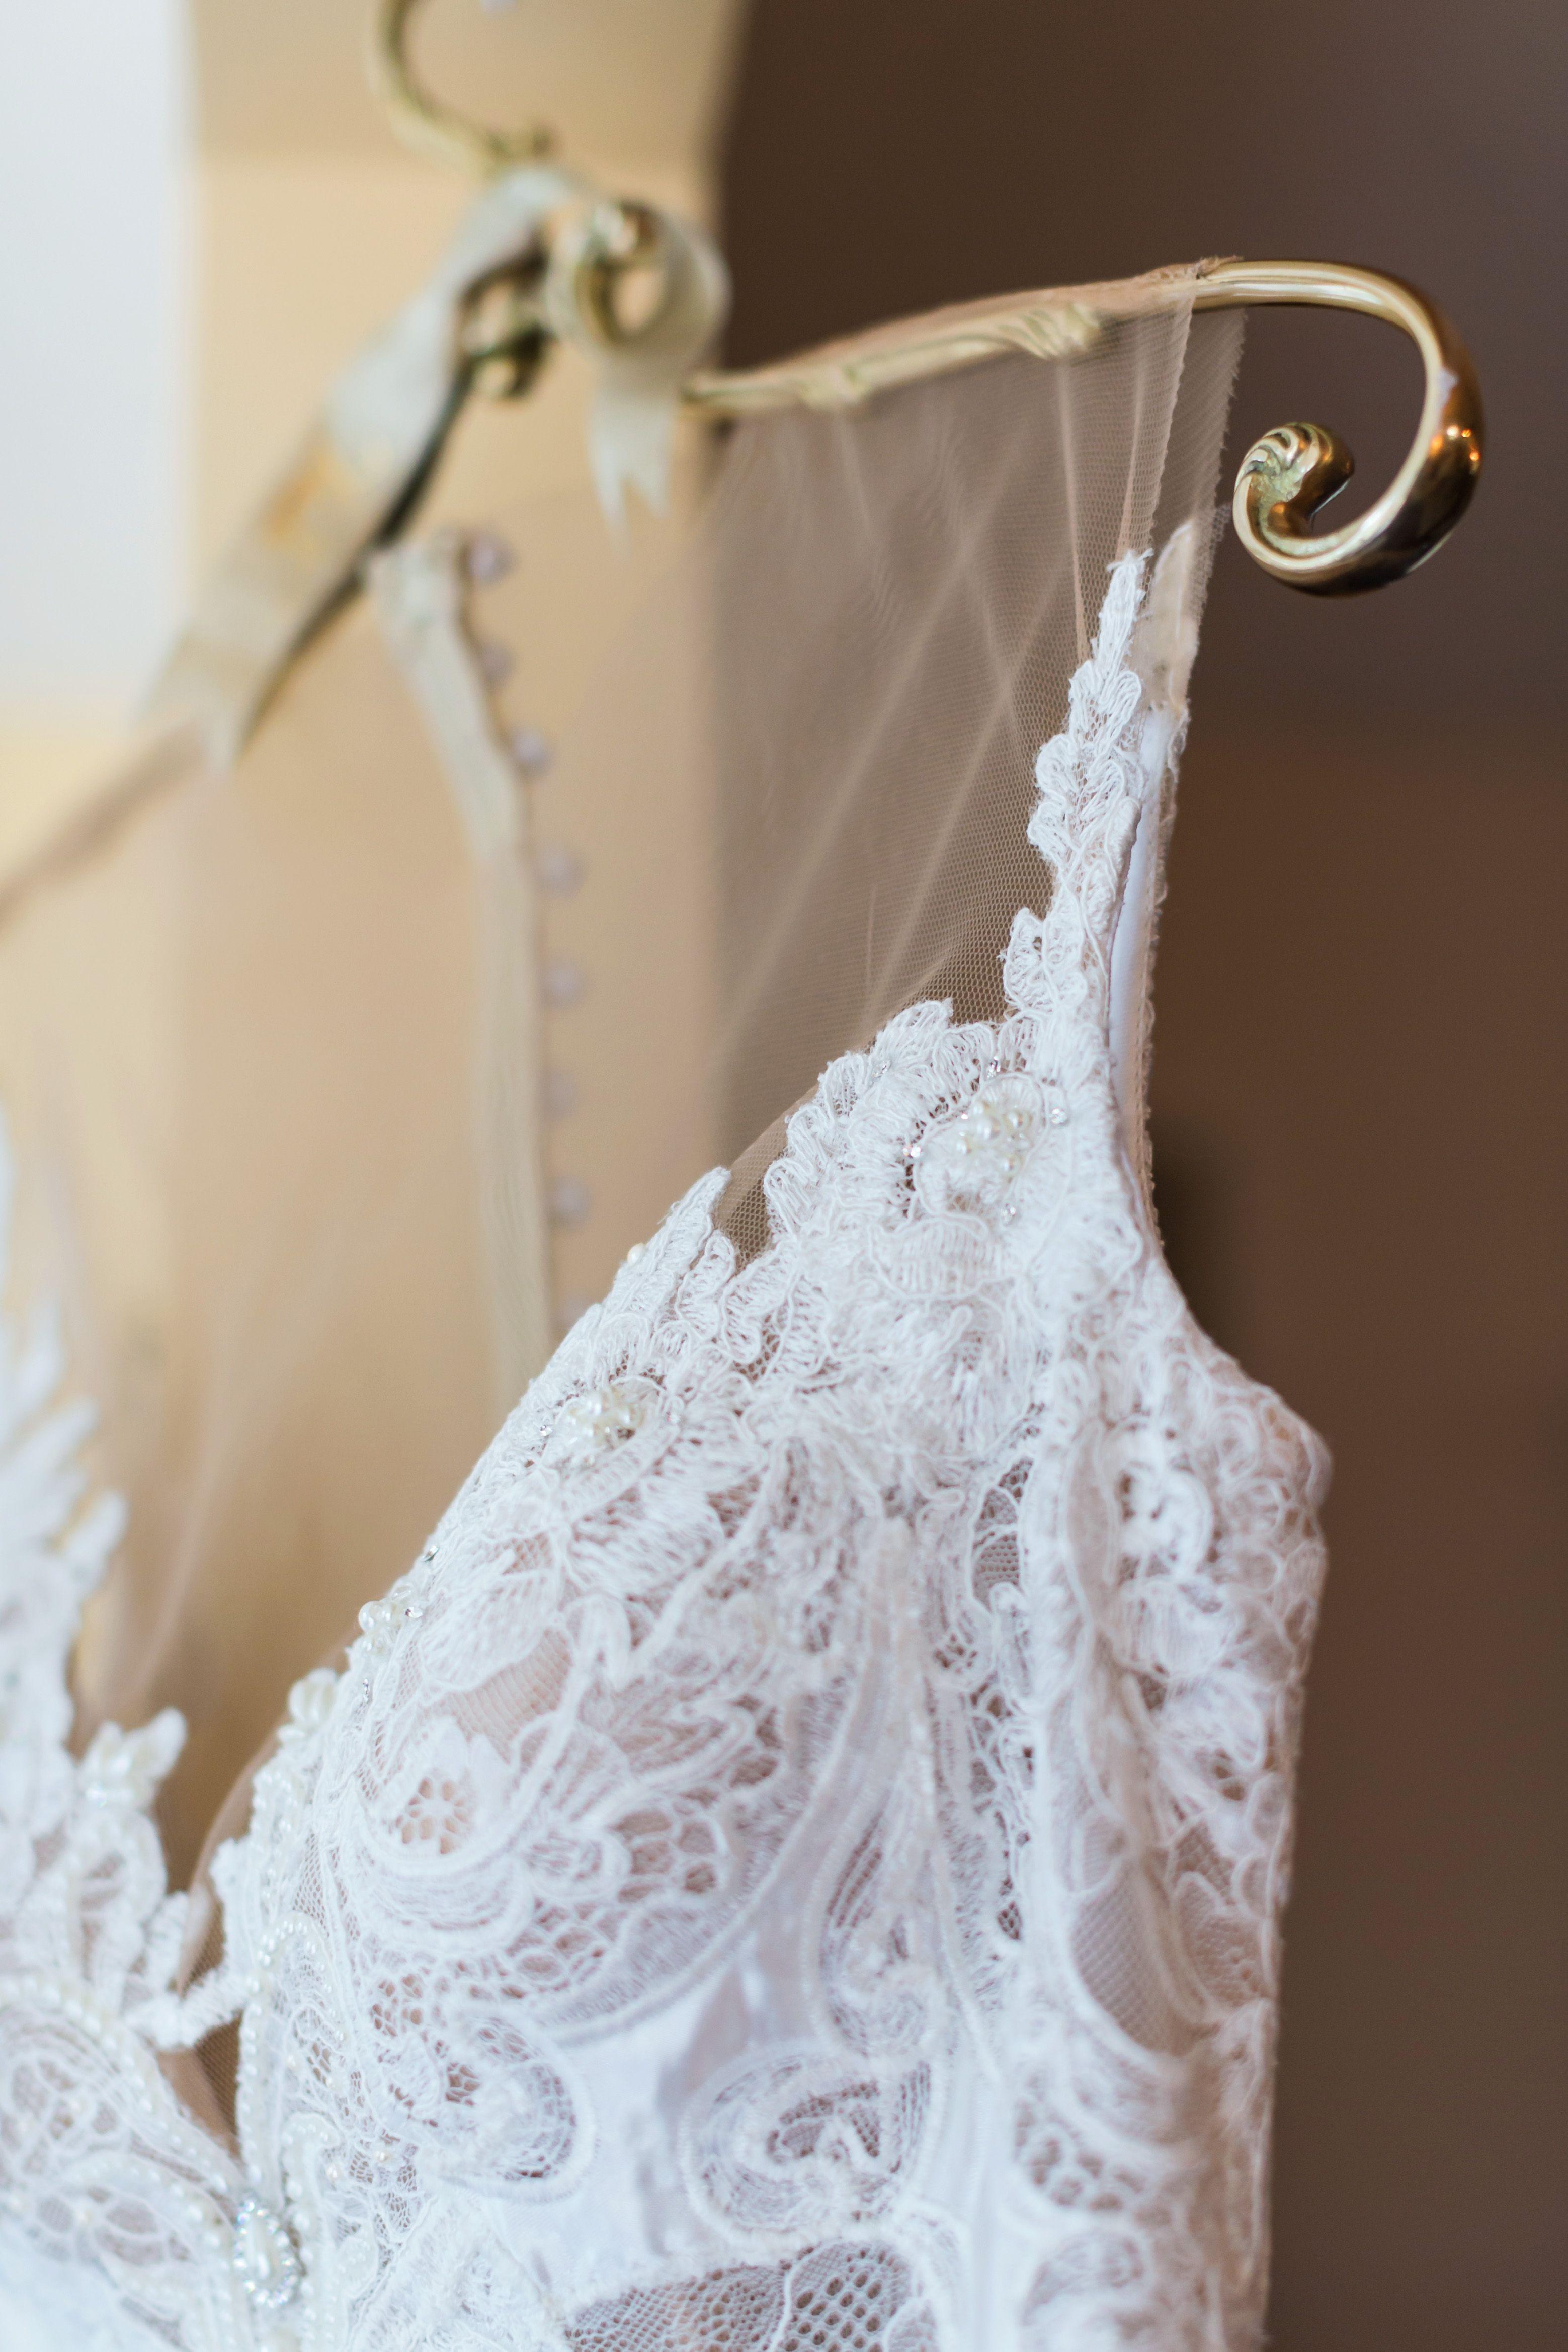 The Prettiest Details Should Always Be Captured Bridal Gown Detail Shots Amazing Wedding Dress Nj Wedding Photographer Photoshoot Inspiration